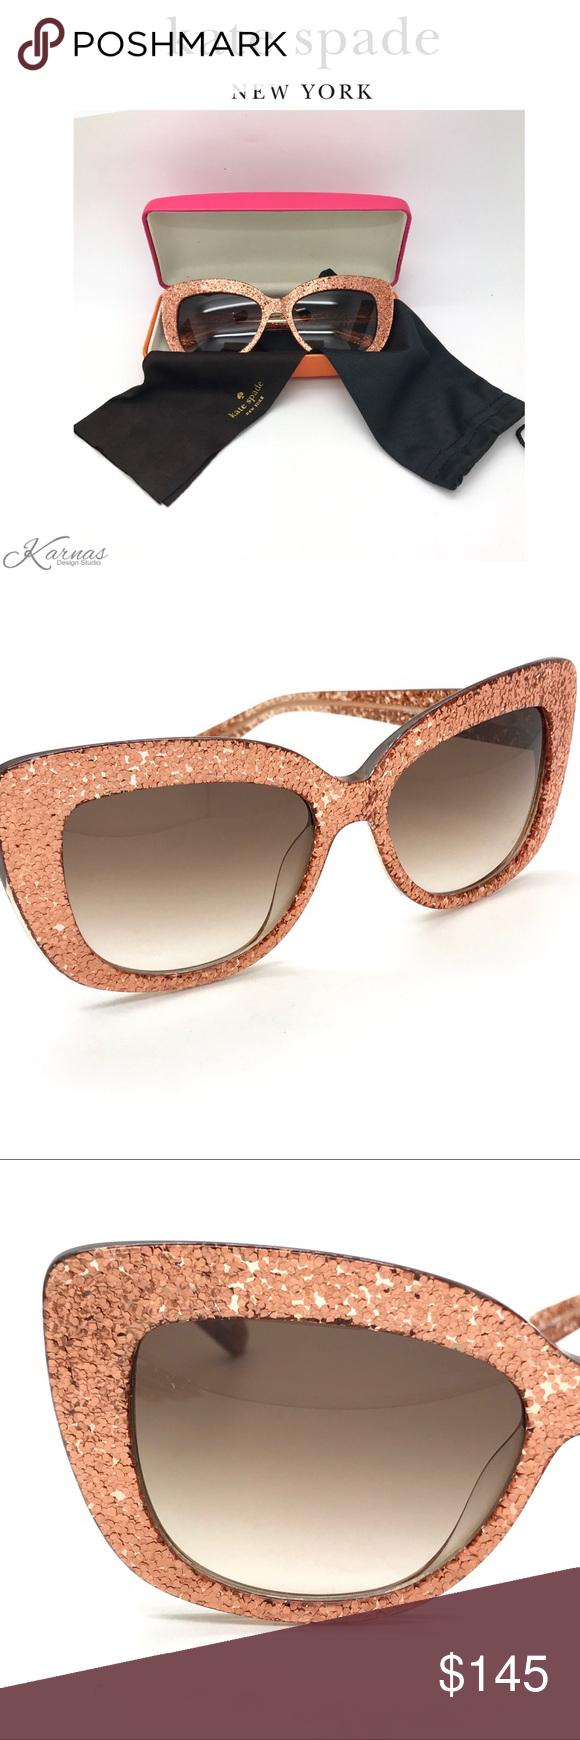 11222b675a23a NWOT Kate Spade Ursula Rose Gold Sunglasses 100% authentic Kate Spade  Ursula Rose